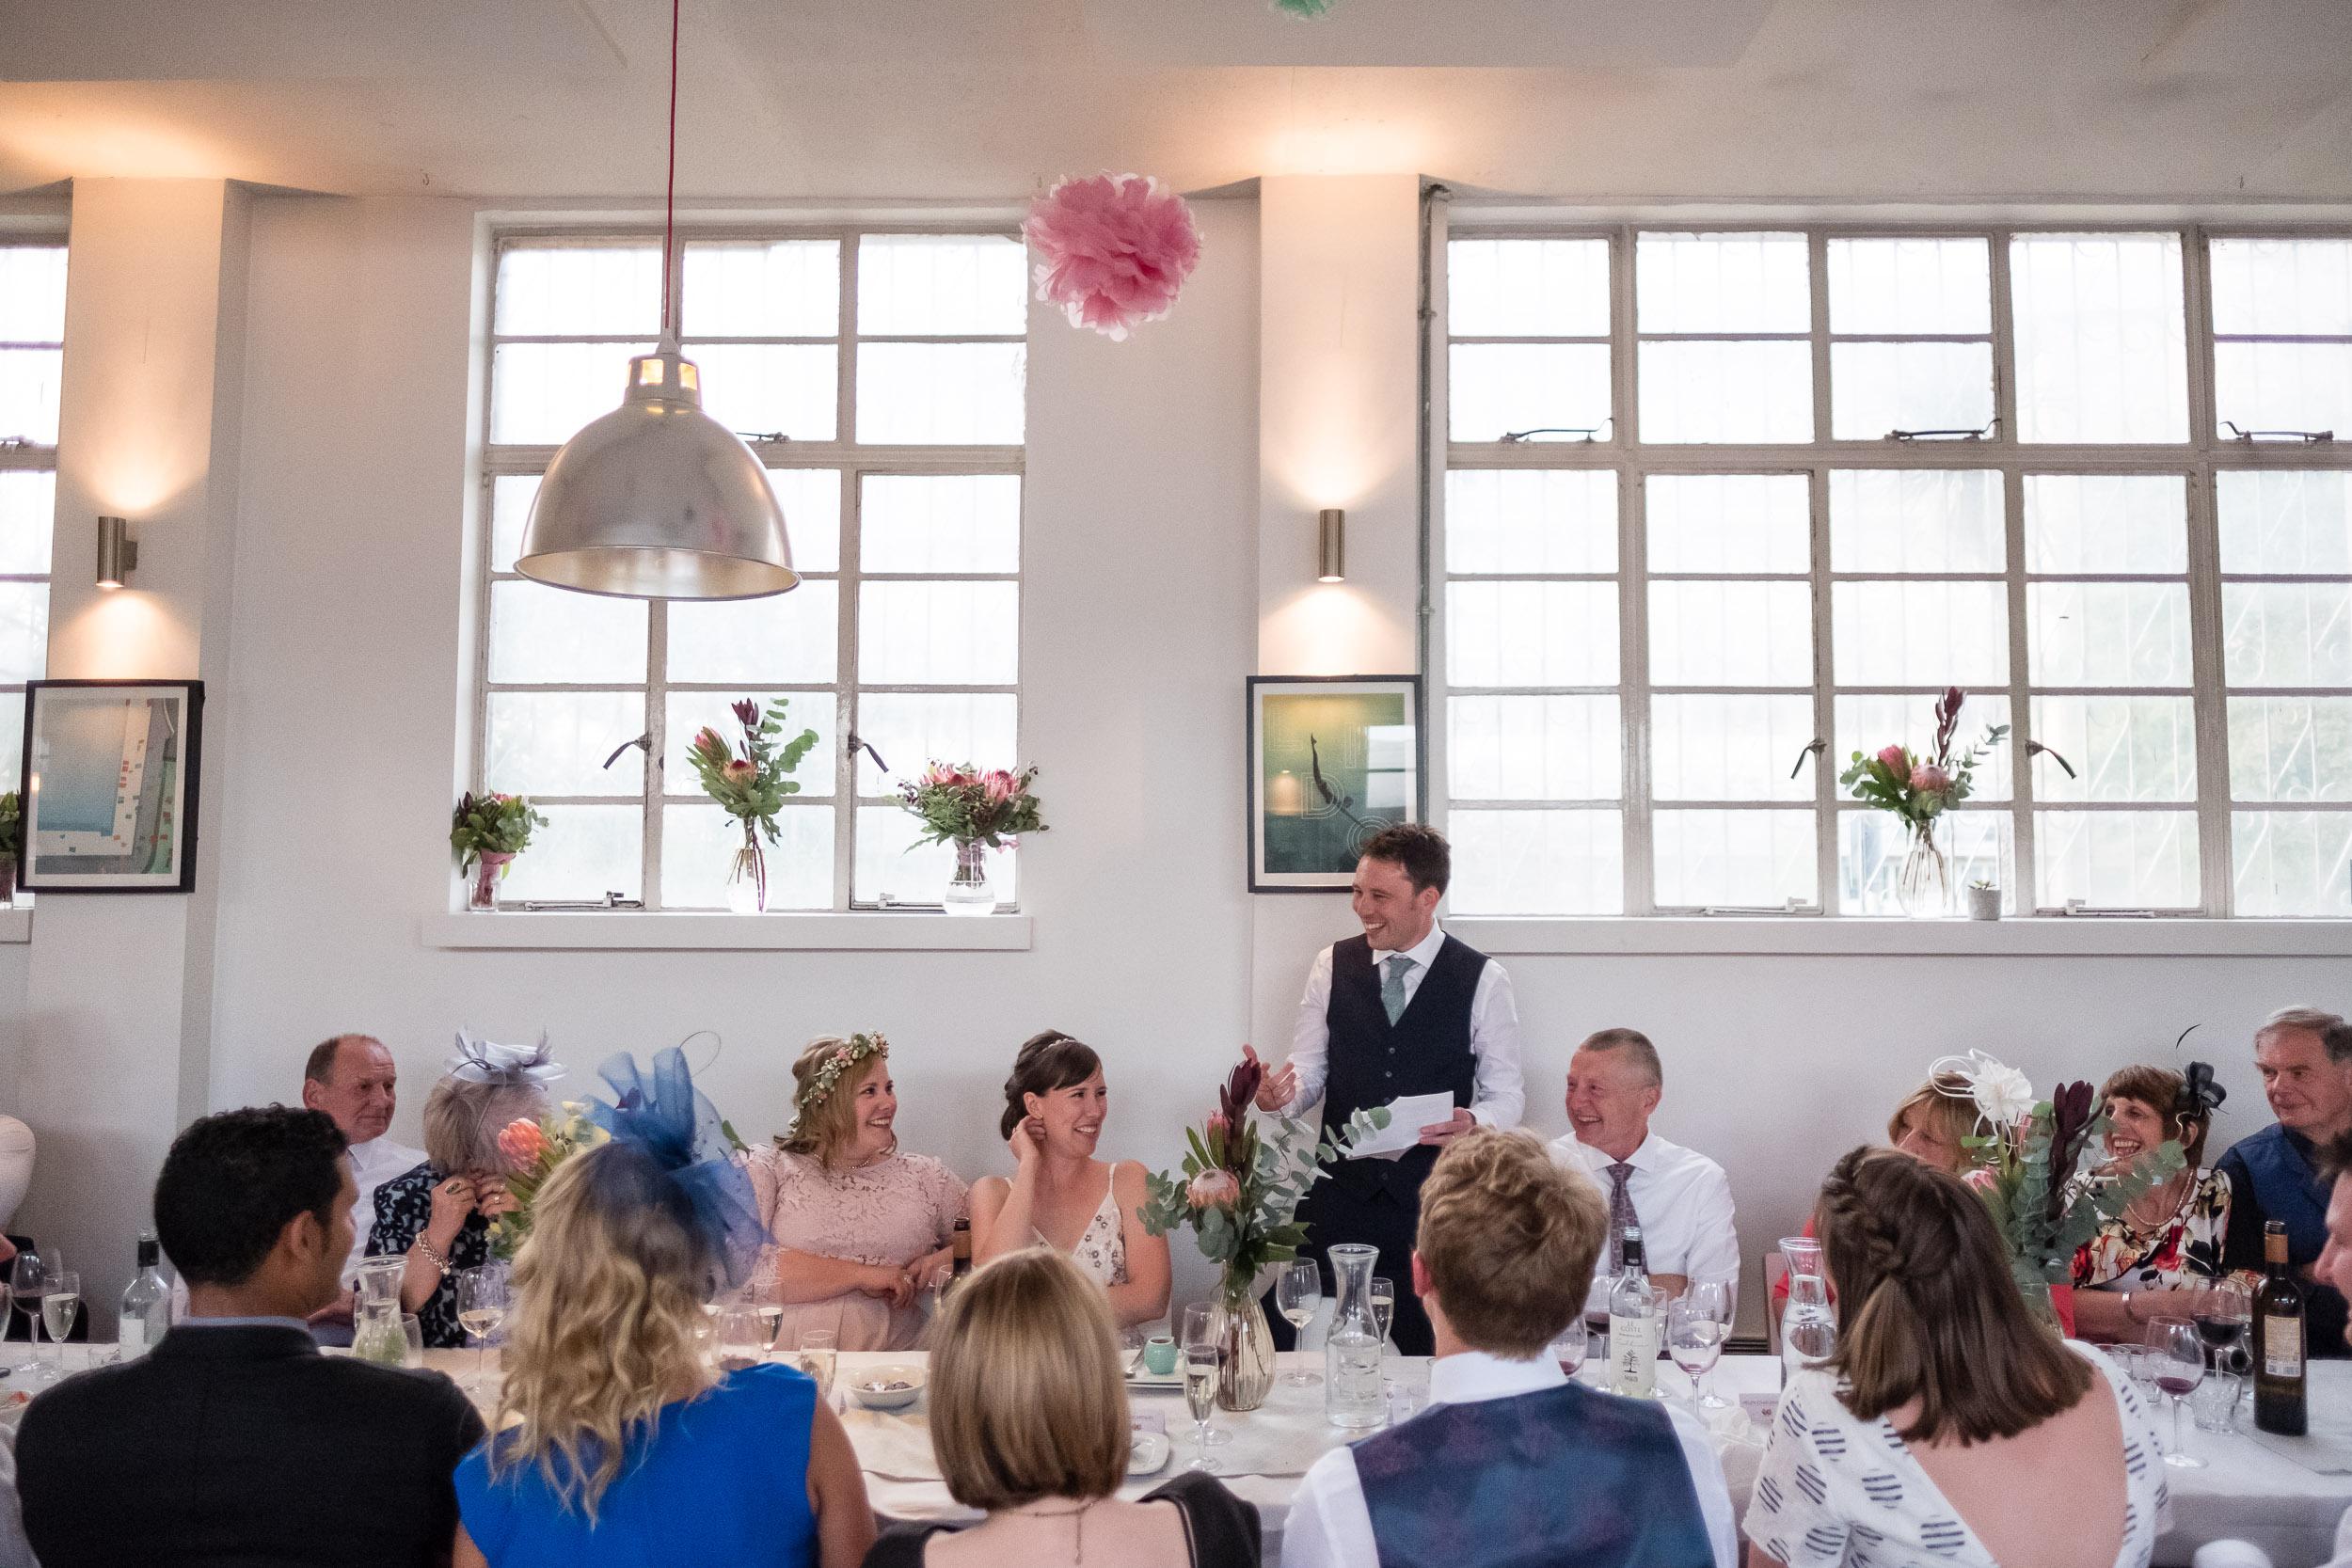 brockwell-lido-brixton-herne-hill-wedding-338.jpg